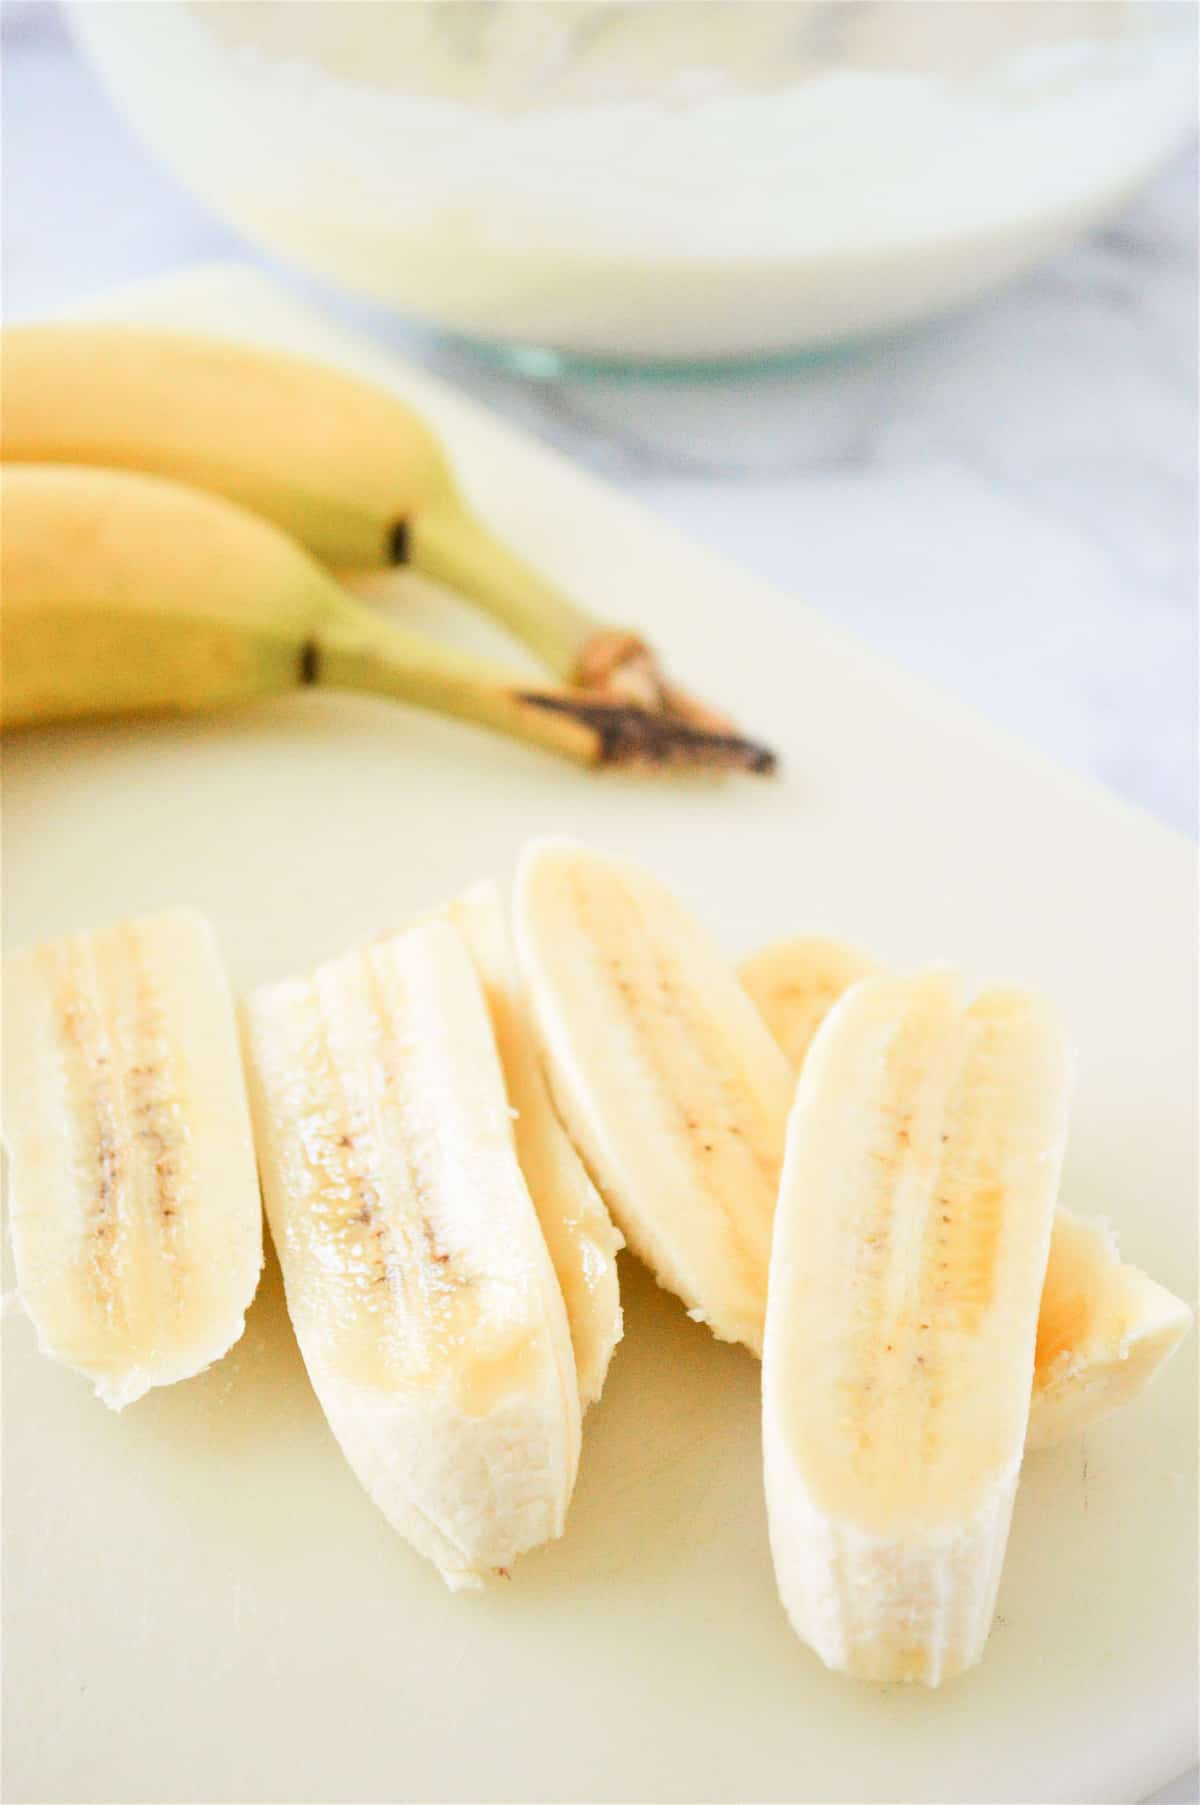 Bananas cut into thin strips.